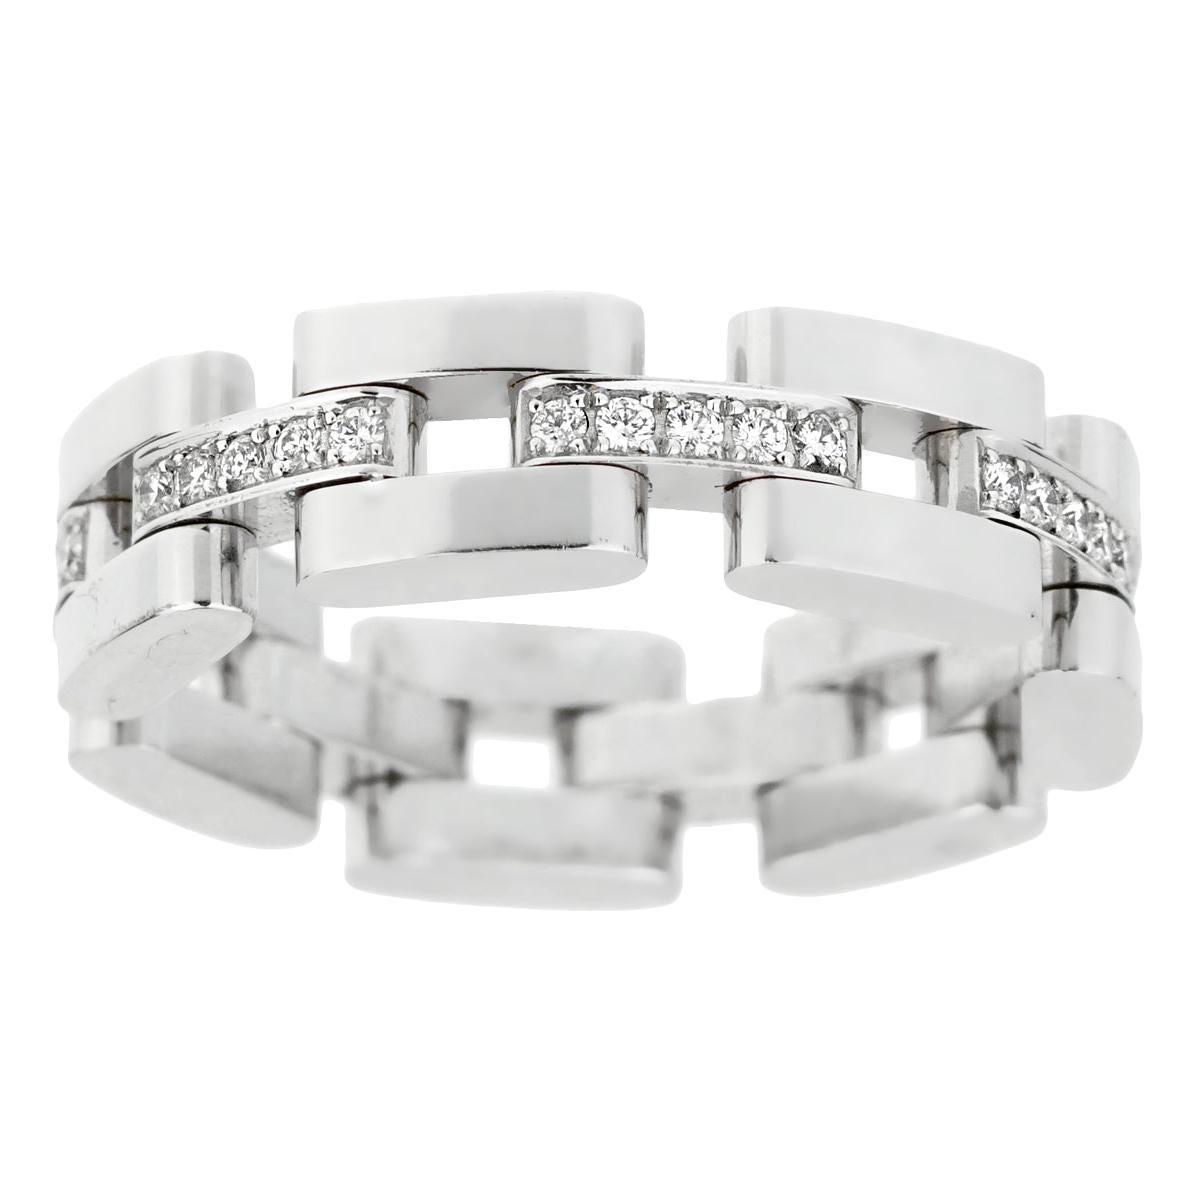 Chopard Les Chaines 3-Row White Gold Diamond Ring